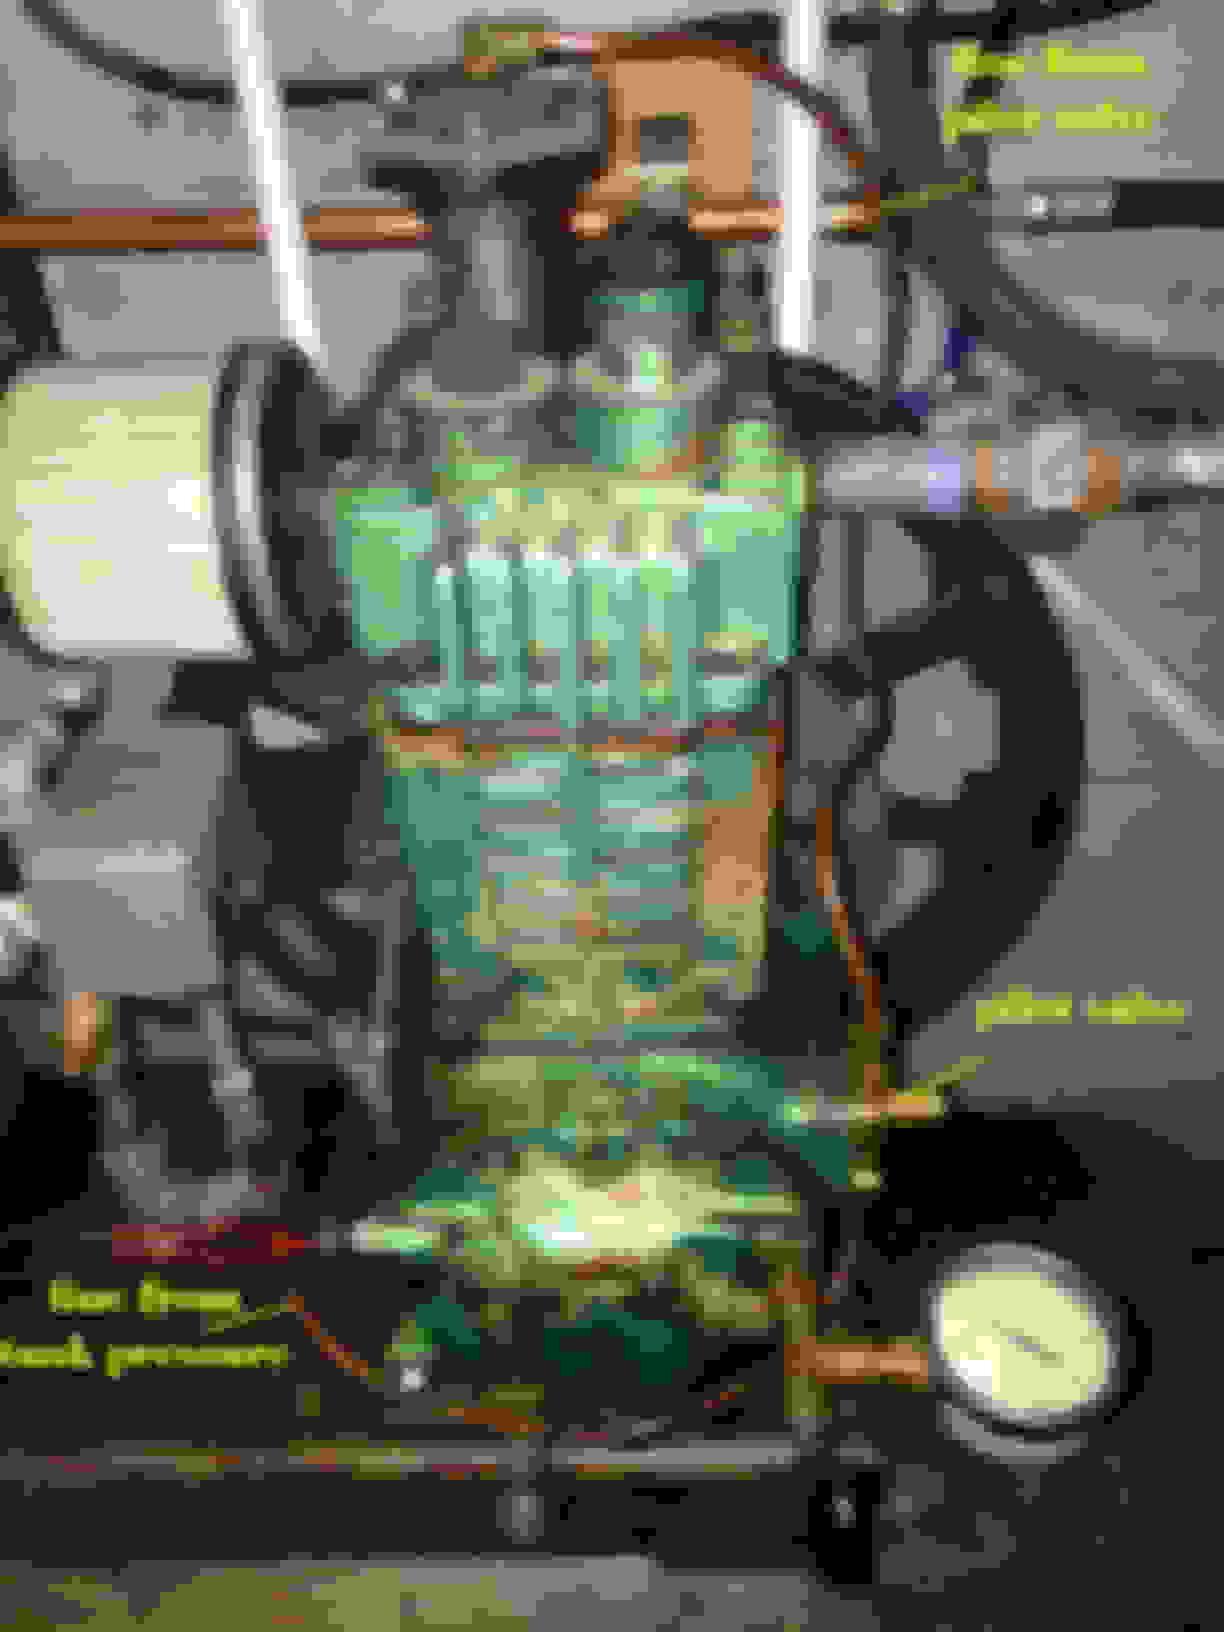 quincy 310 compressor unloader problem - Ford Truck